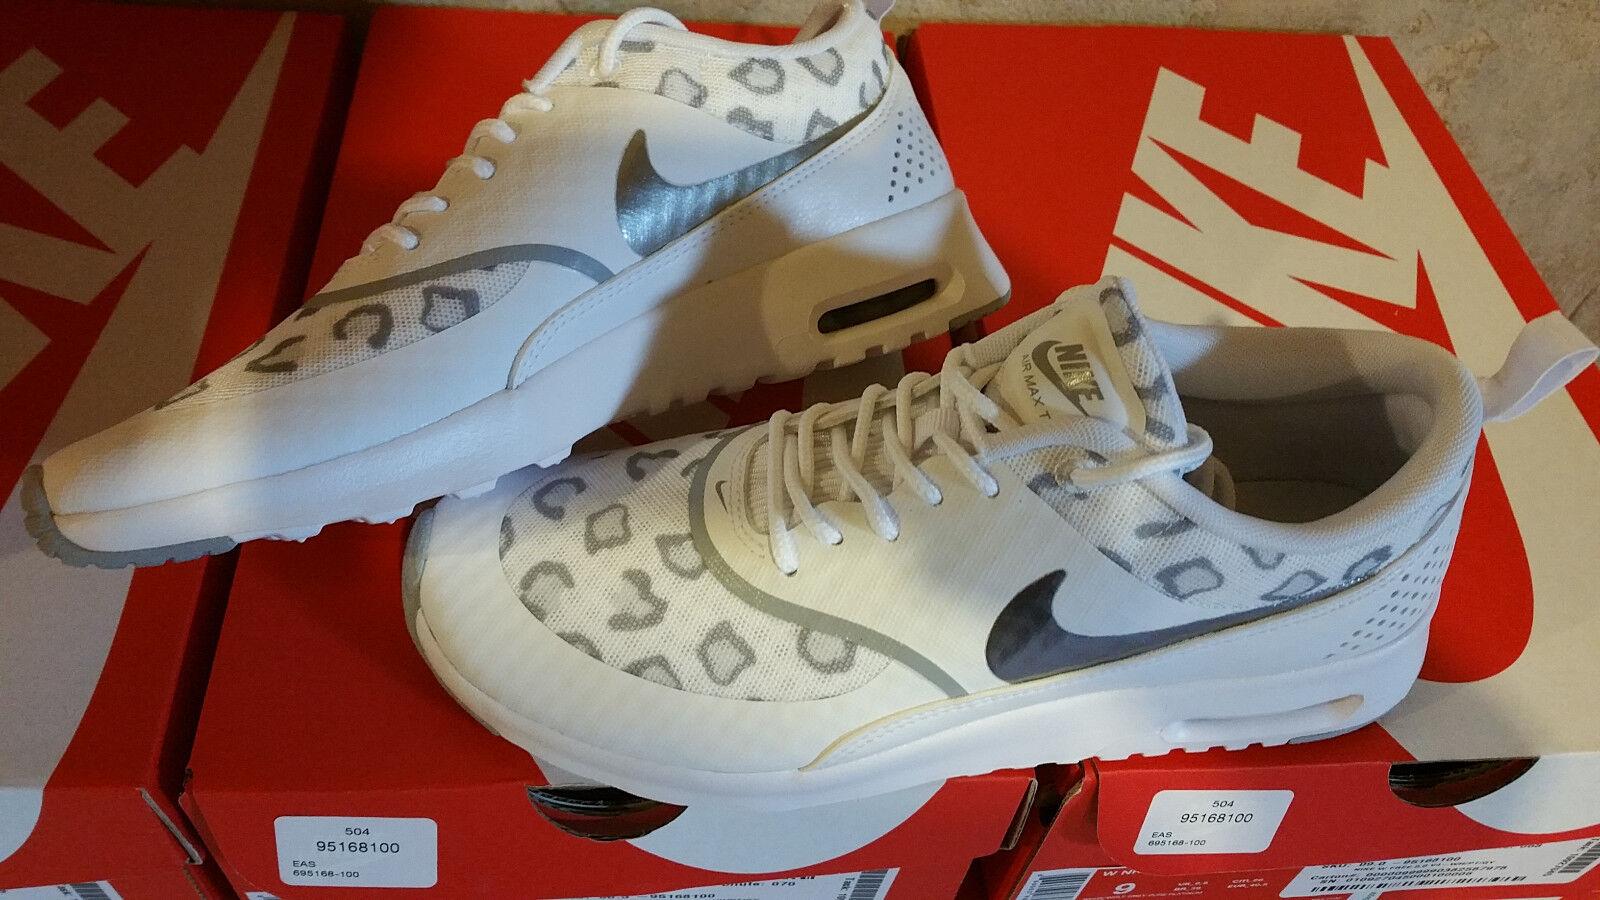 Nike air jordan 1 'alto bg rosso carminio sz - wmns sz 8 [705300-601]